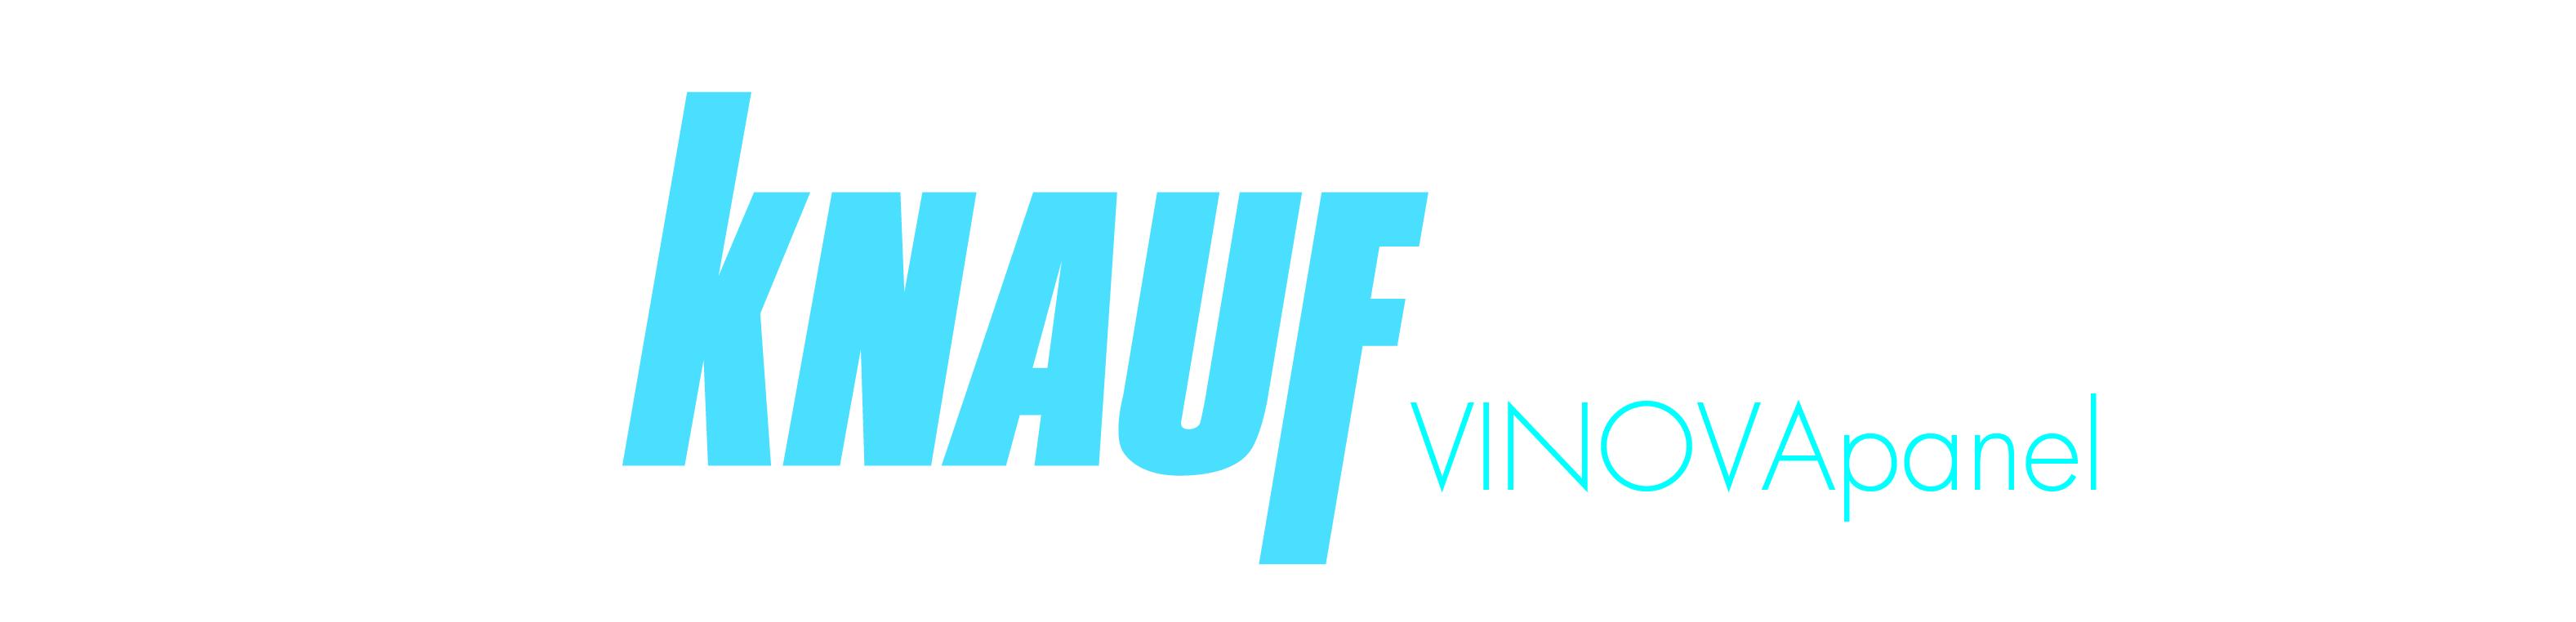 logotipo vinovapanel knauf